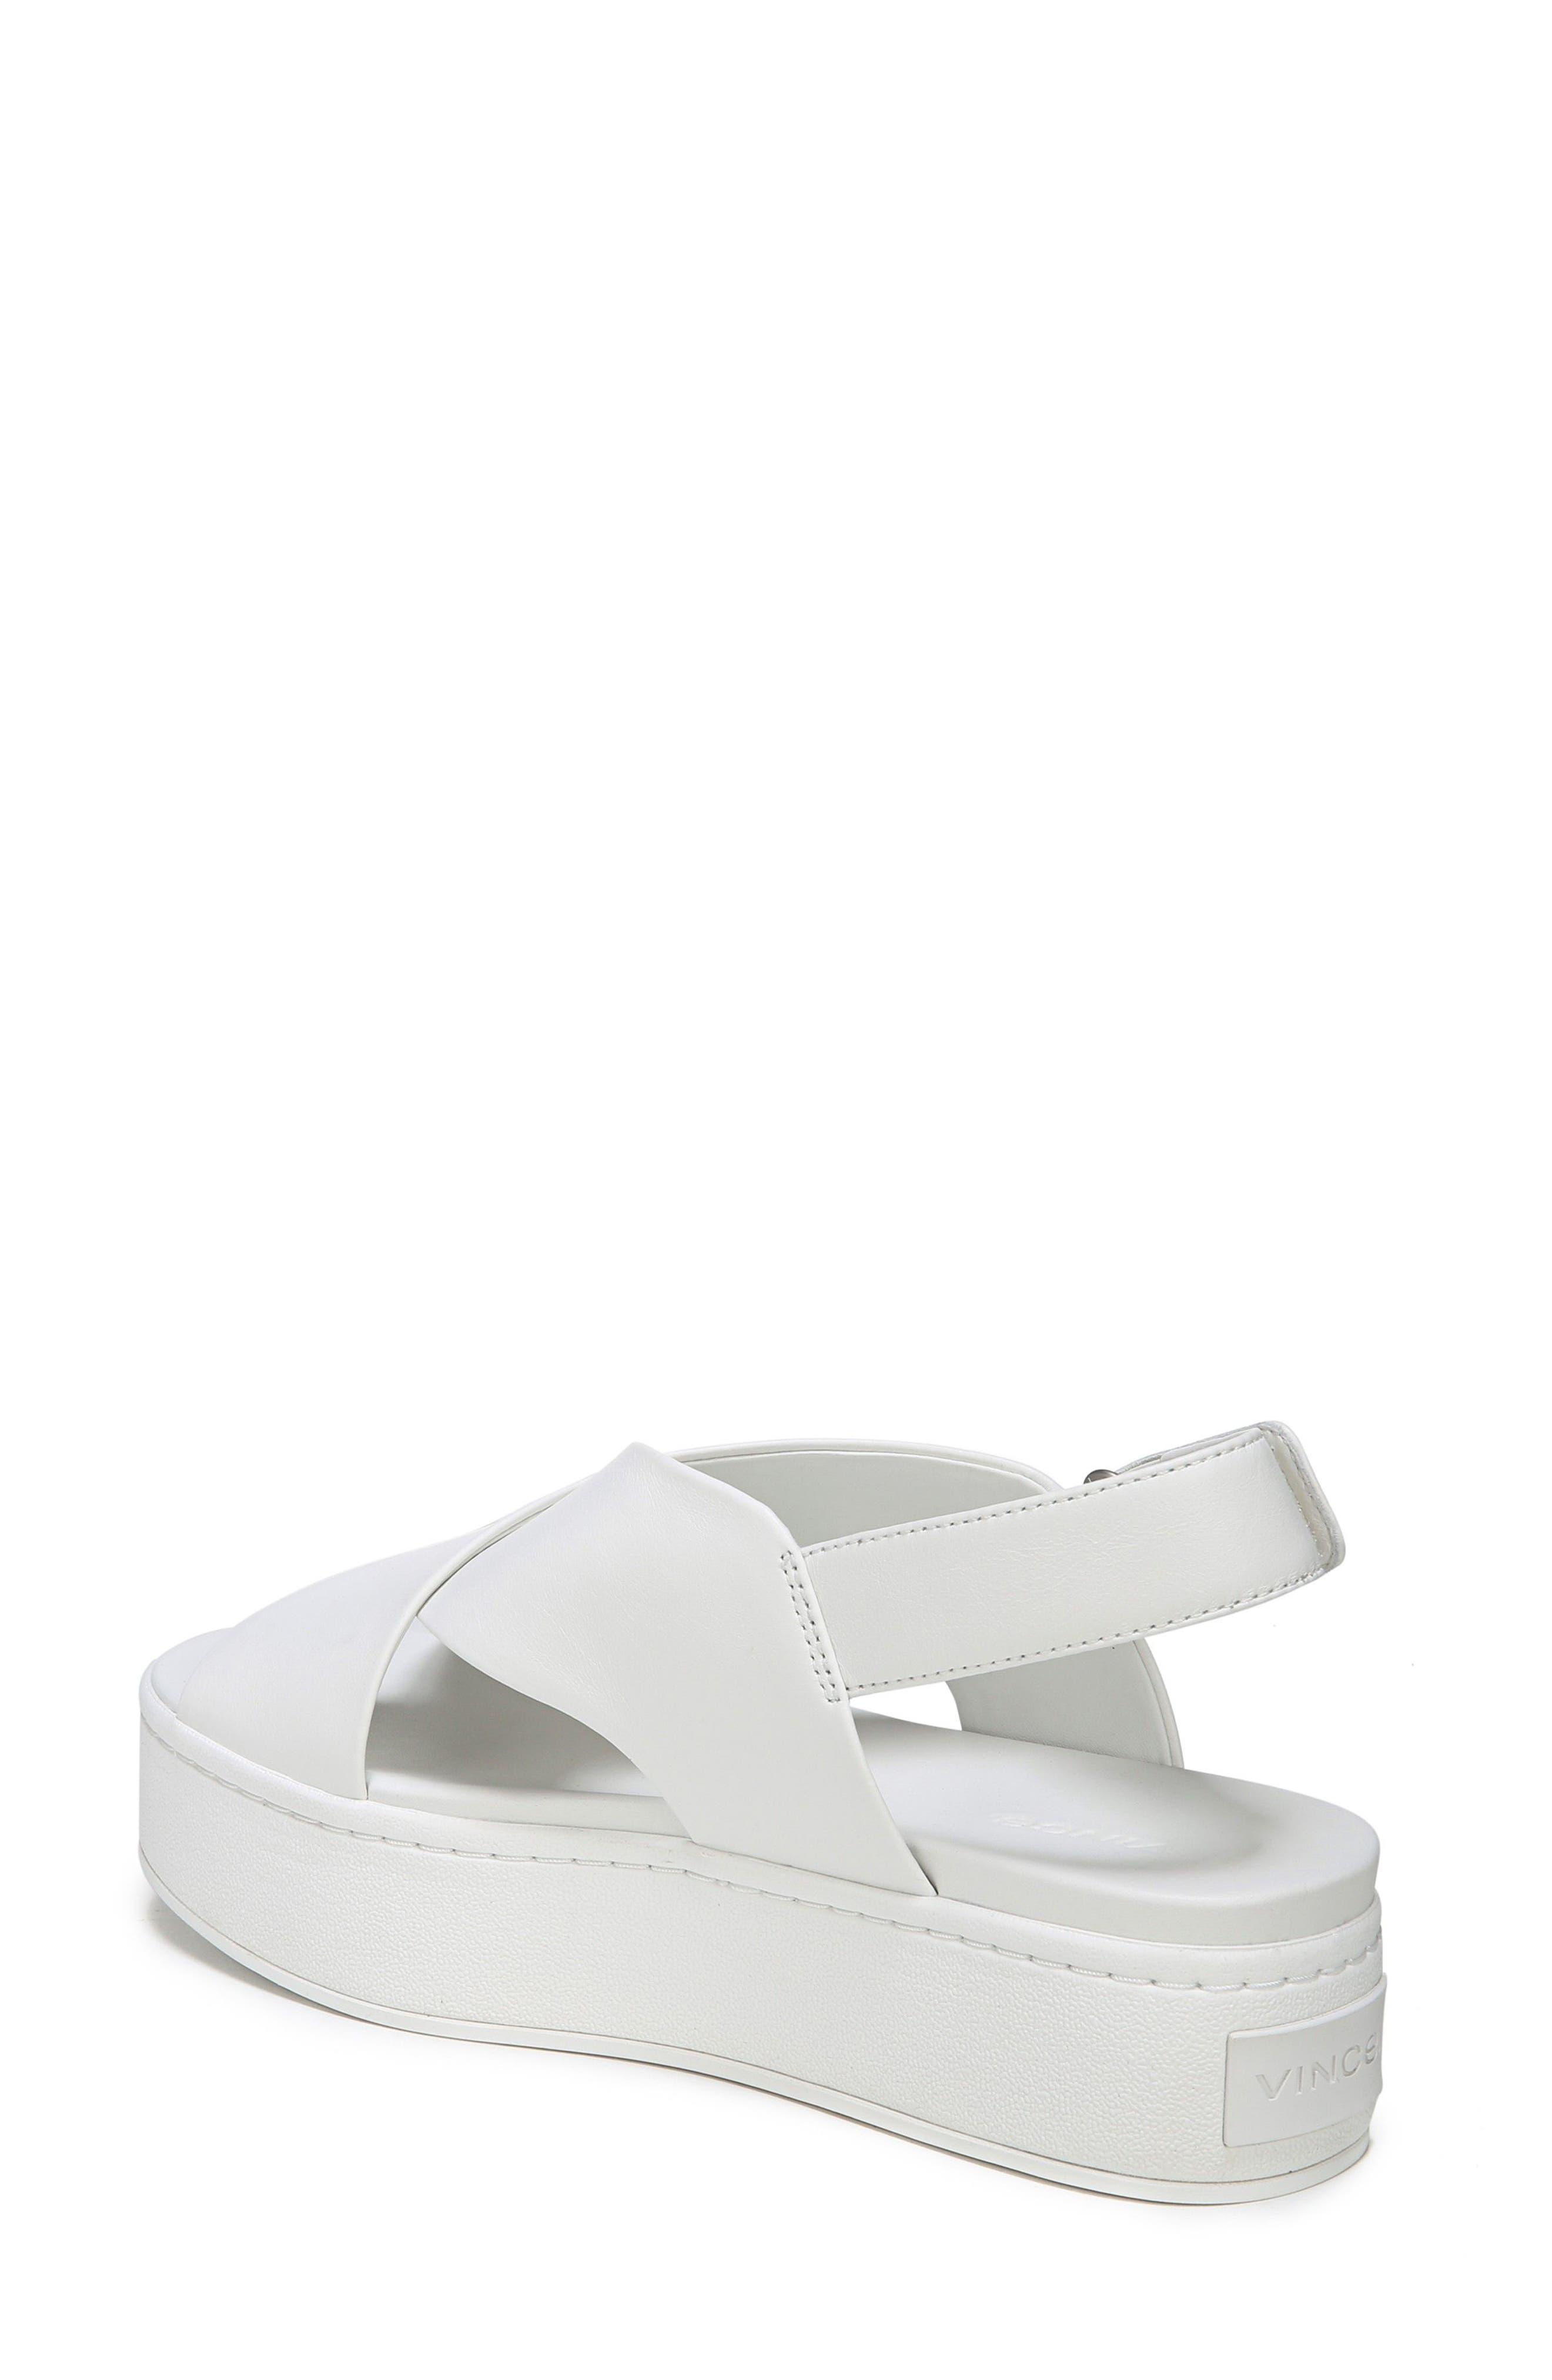 Weslan Cross Strap Slingback Sandal,                             Alternate thumbnail 2, color,                             Horchata